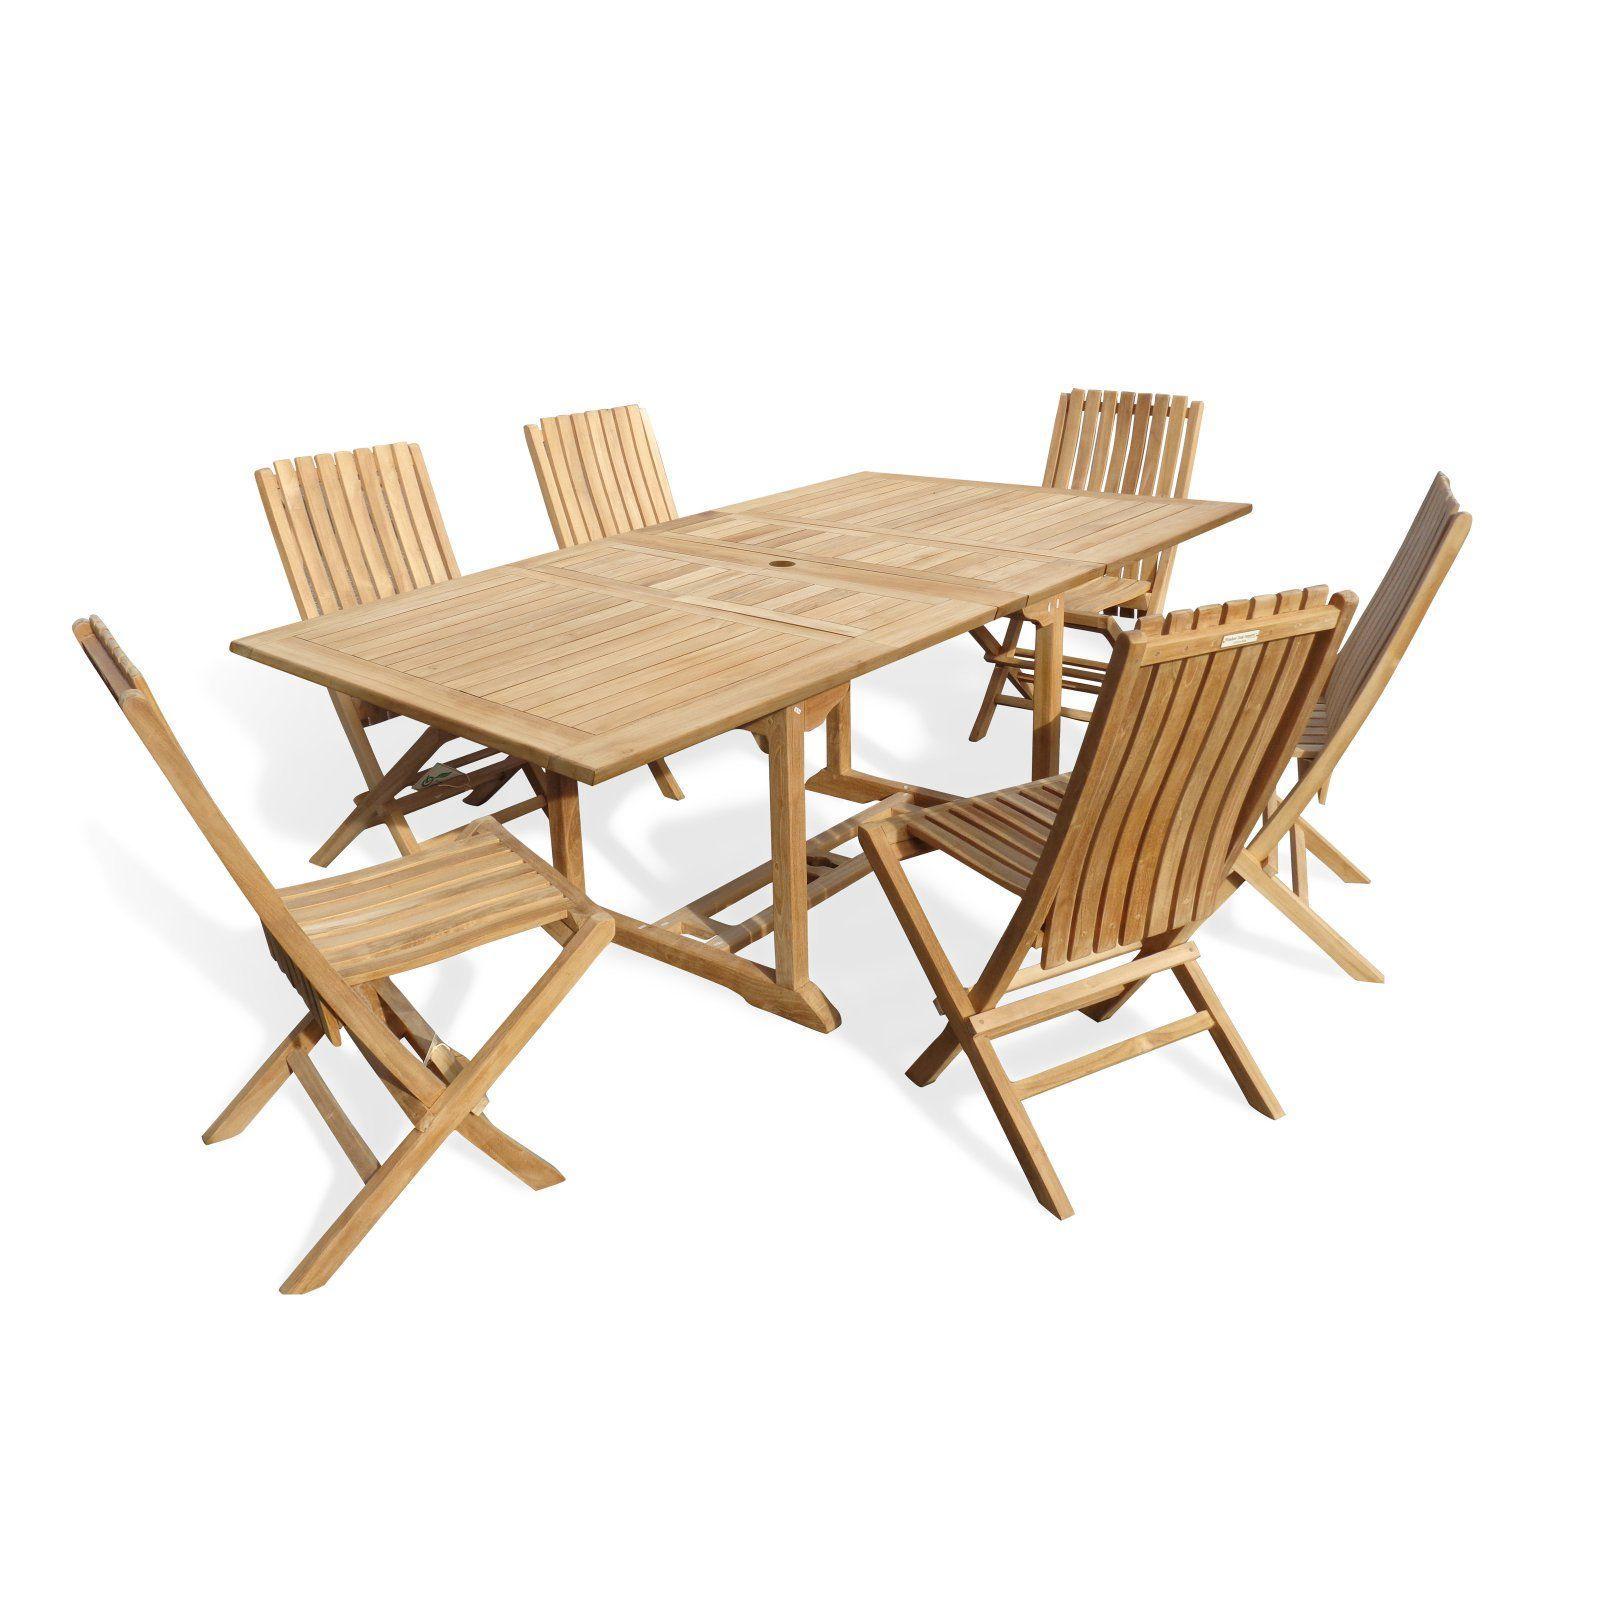 Outdoor Windsor Teak Furniture Buckingham Premium Teak 7 Piece